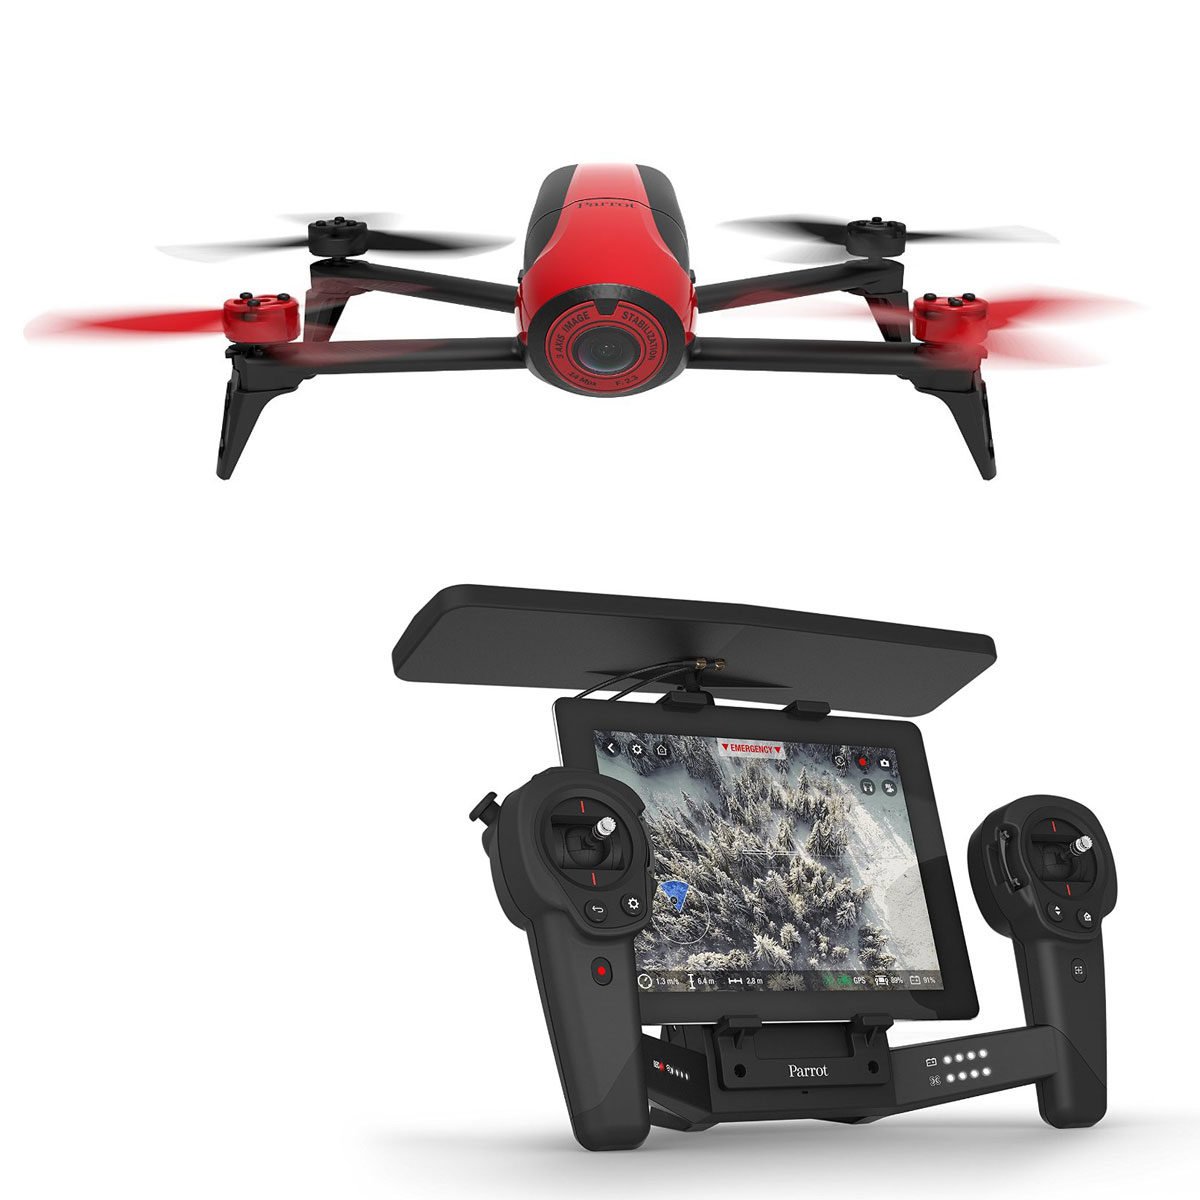 acheter un drone avec caméra